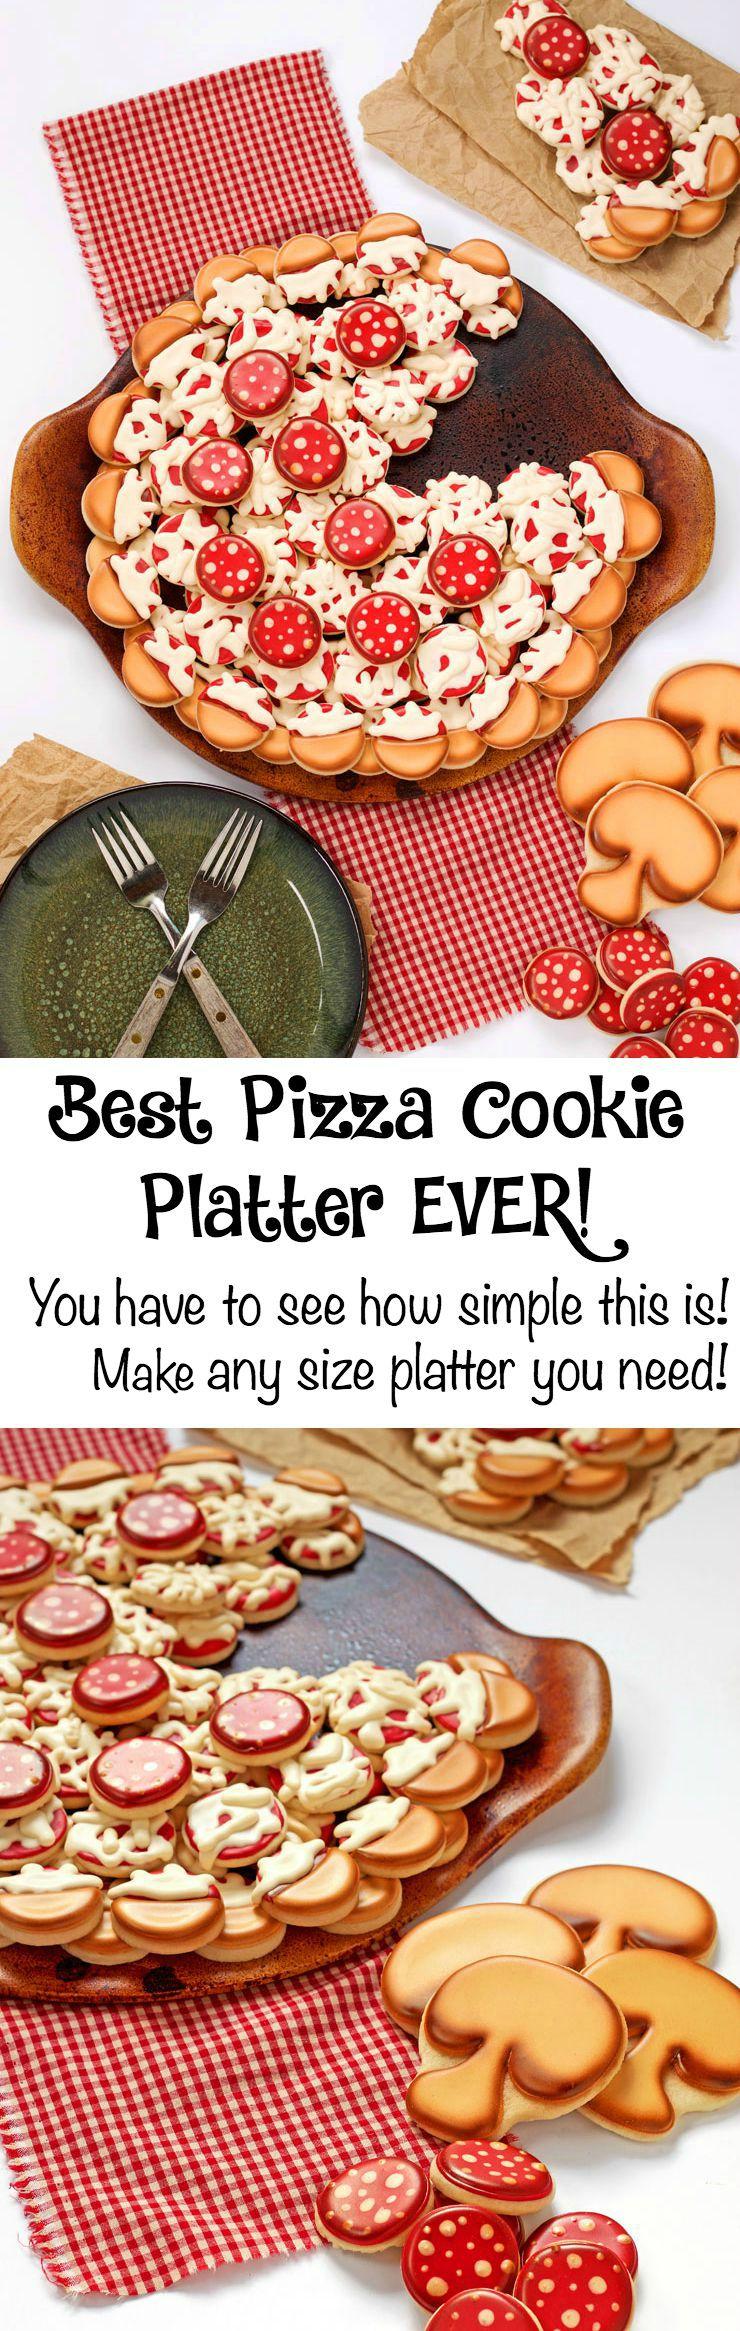 Pizza Cookie Platter via www.thebearfootbaker.com